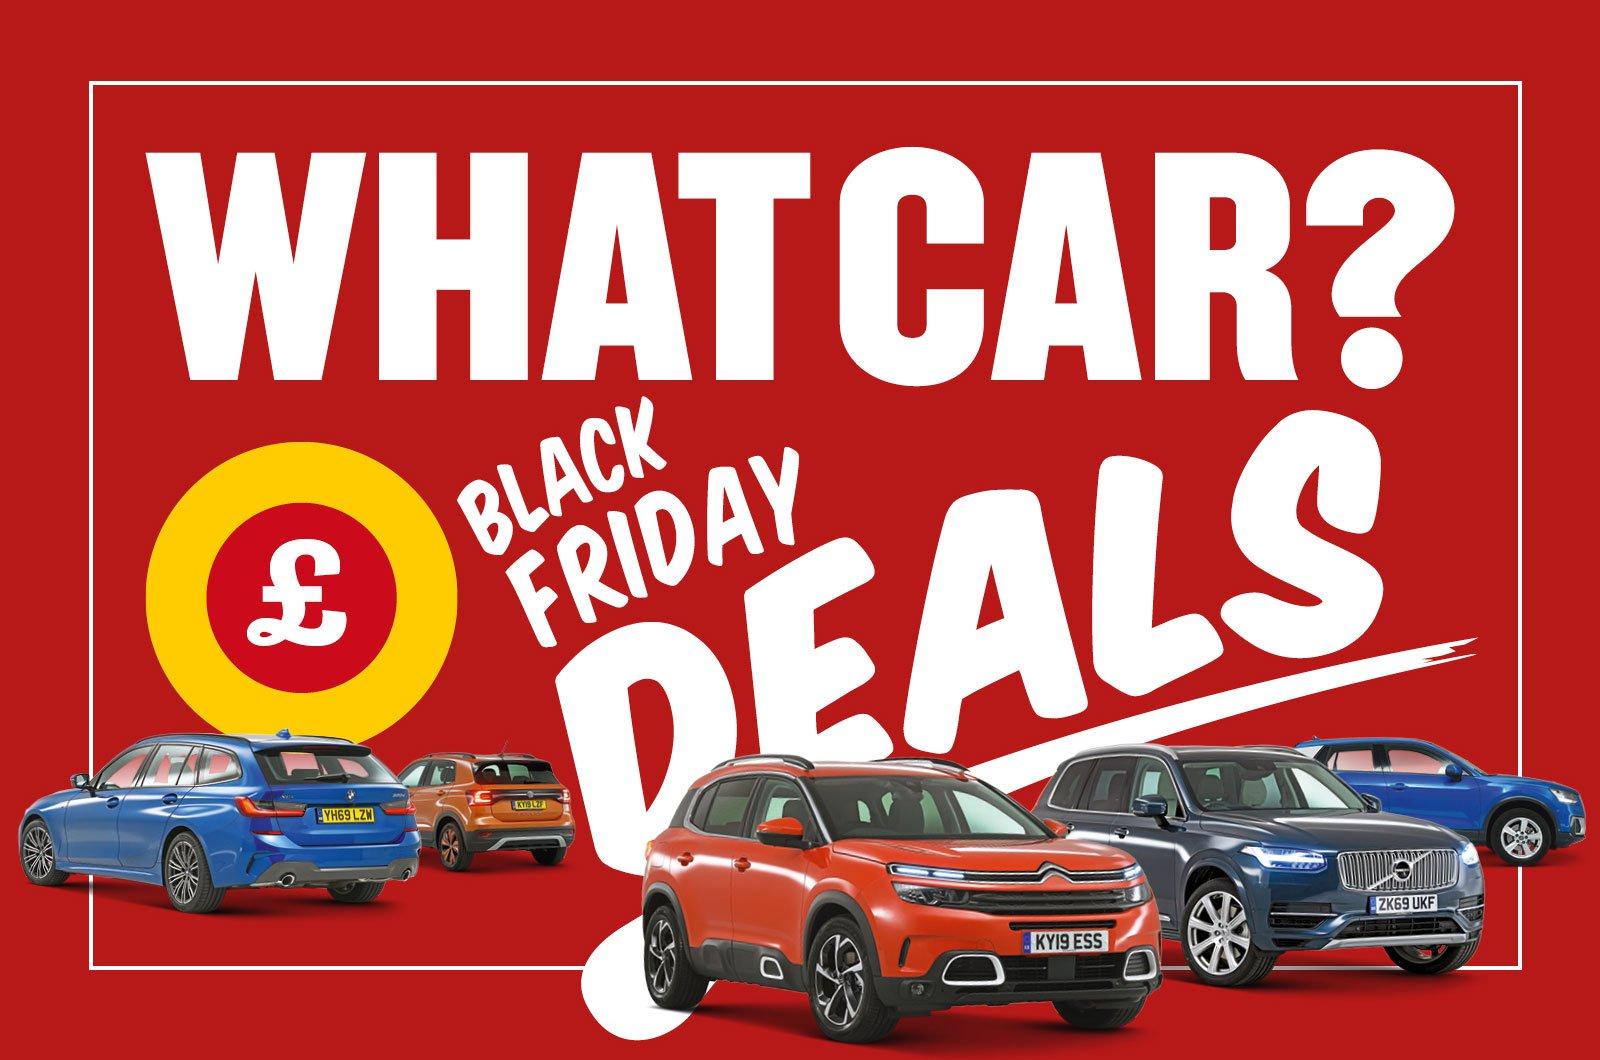 What Car? Black Friday deals